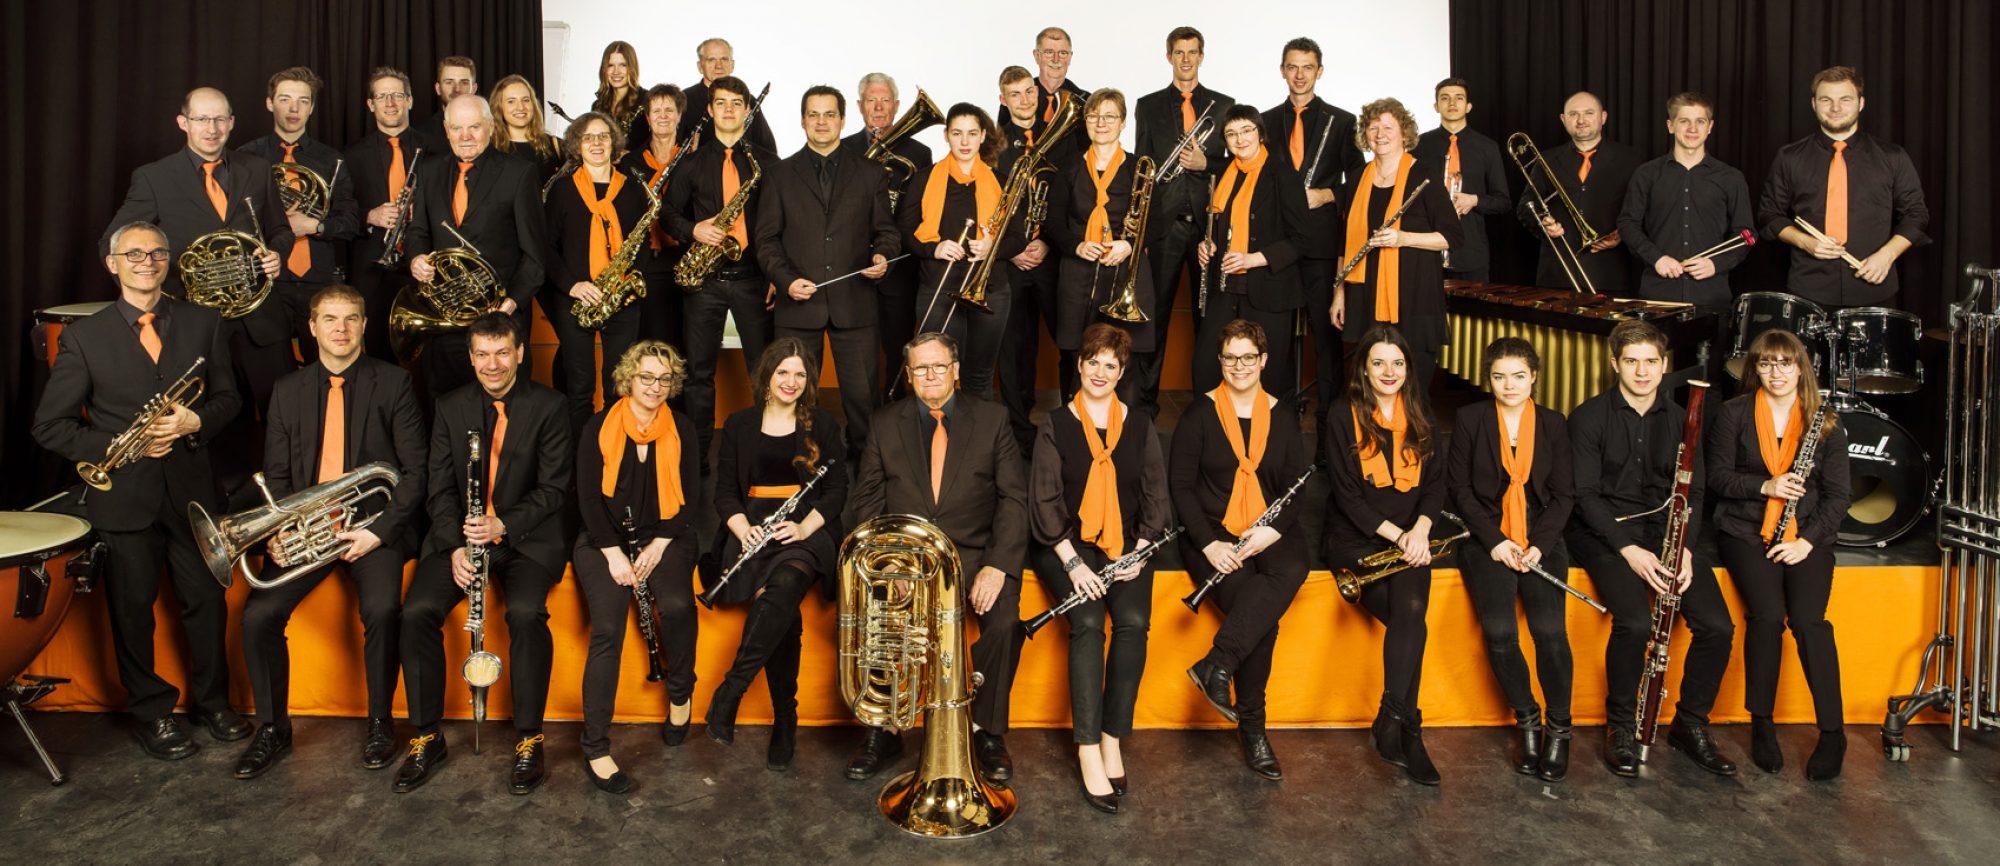 Orchesterverein St. Martin Mainz Finthen